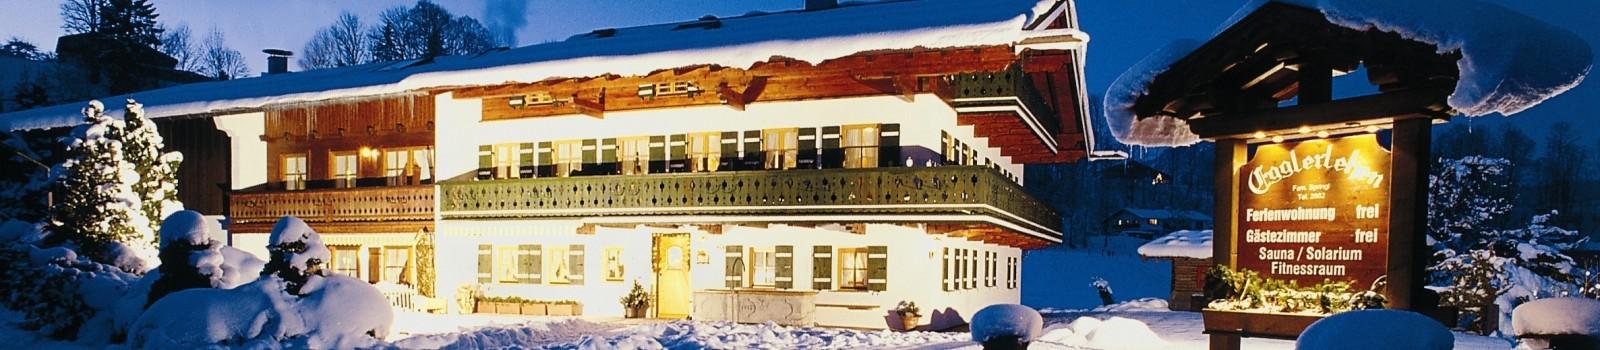 Winterurlaub in Berchtesgaden